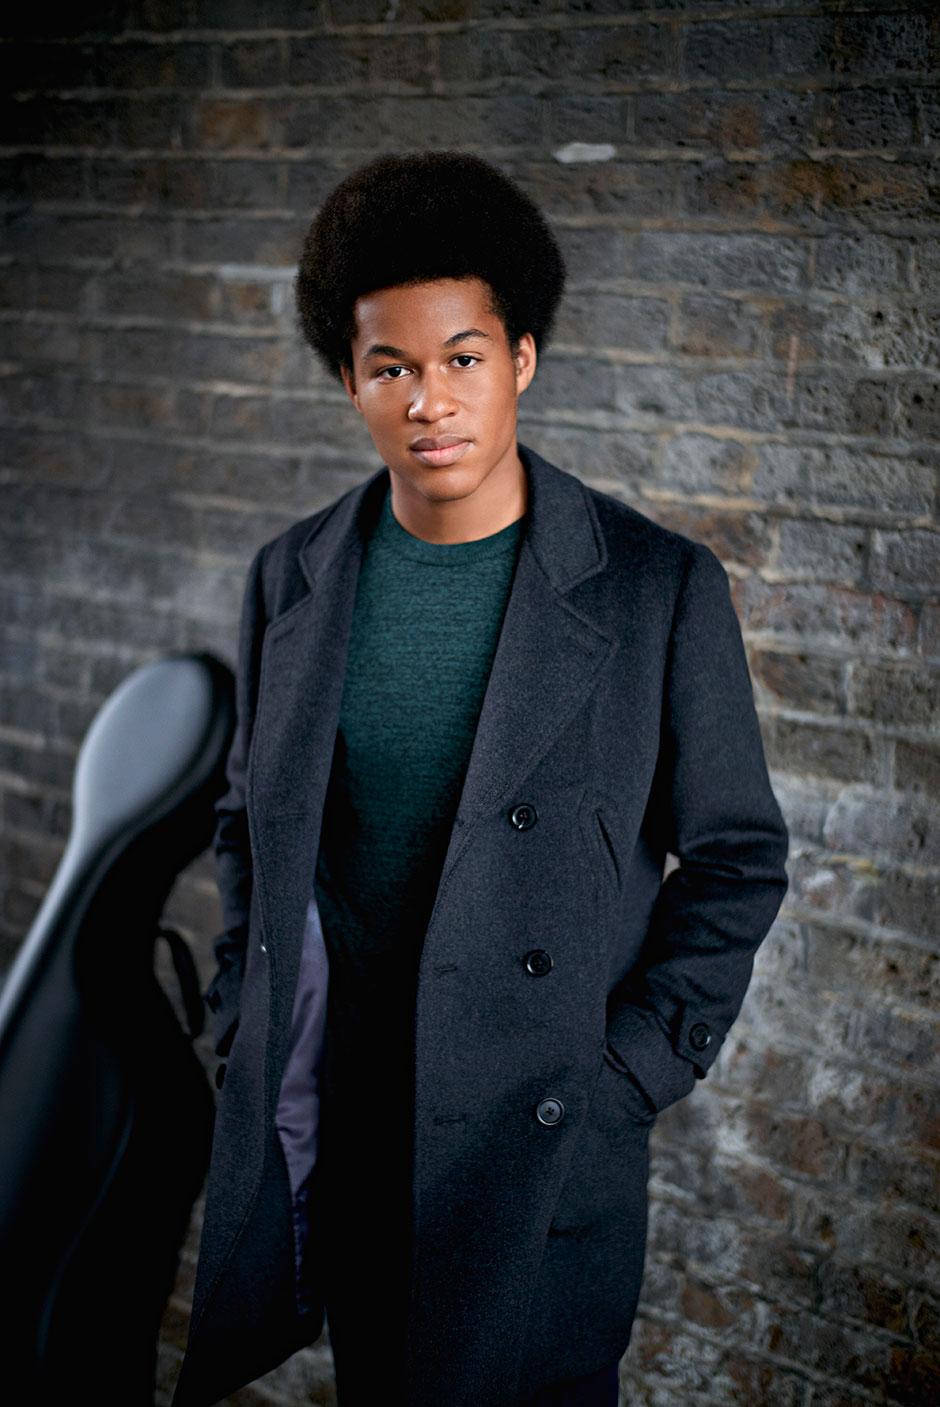 Cellist Sheku Kanneh-Maso editorial shoot against grey brick wall